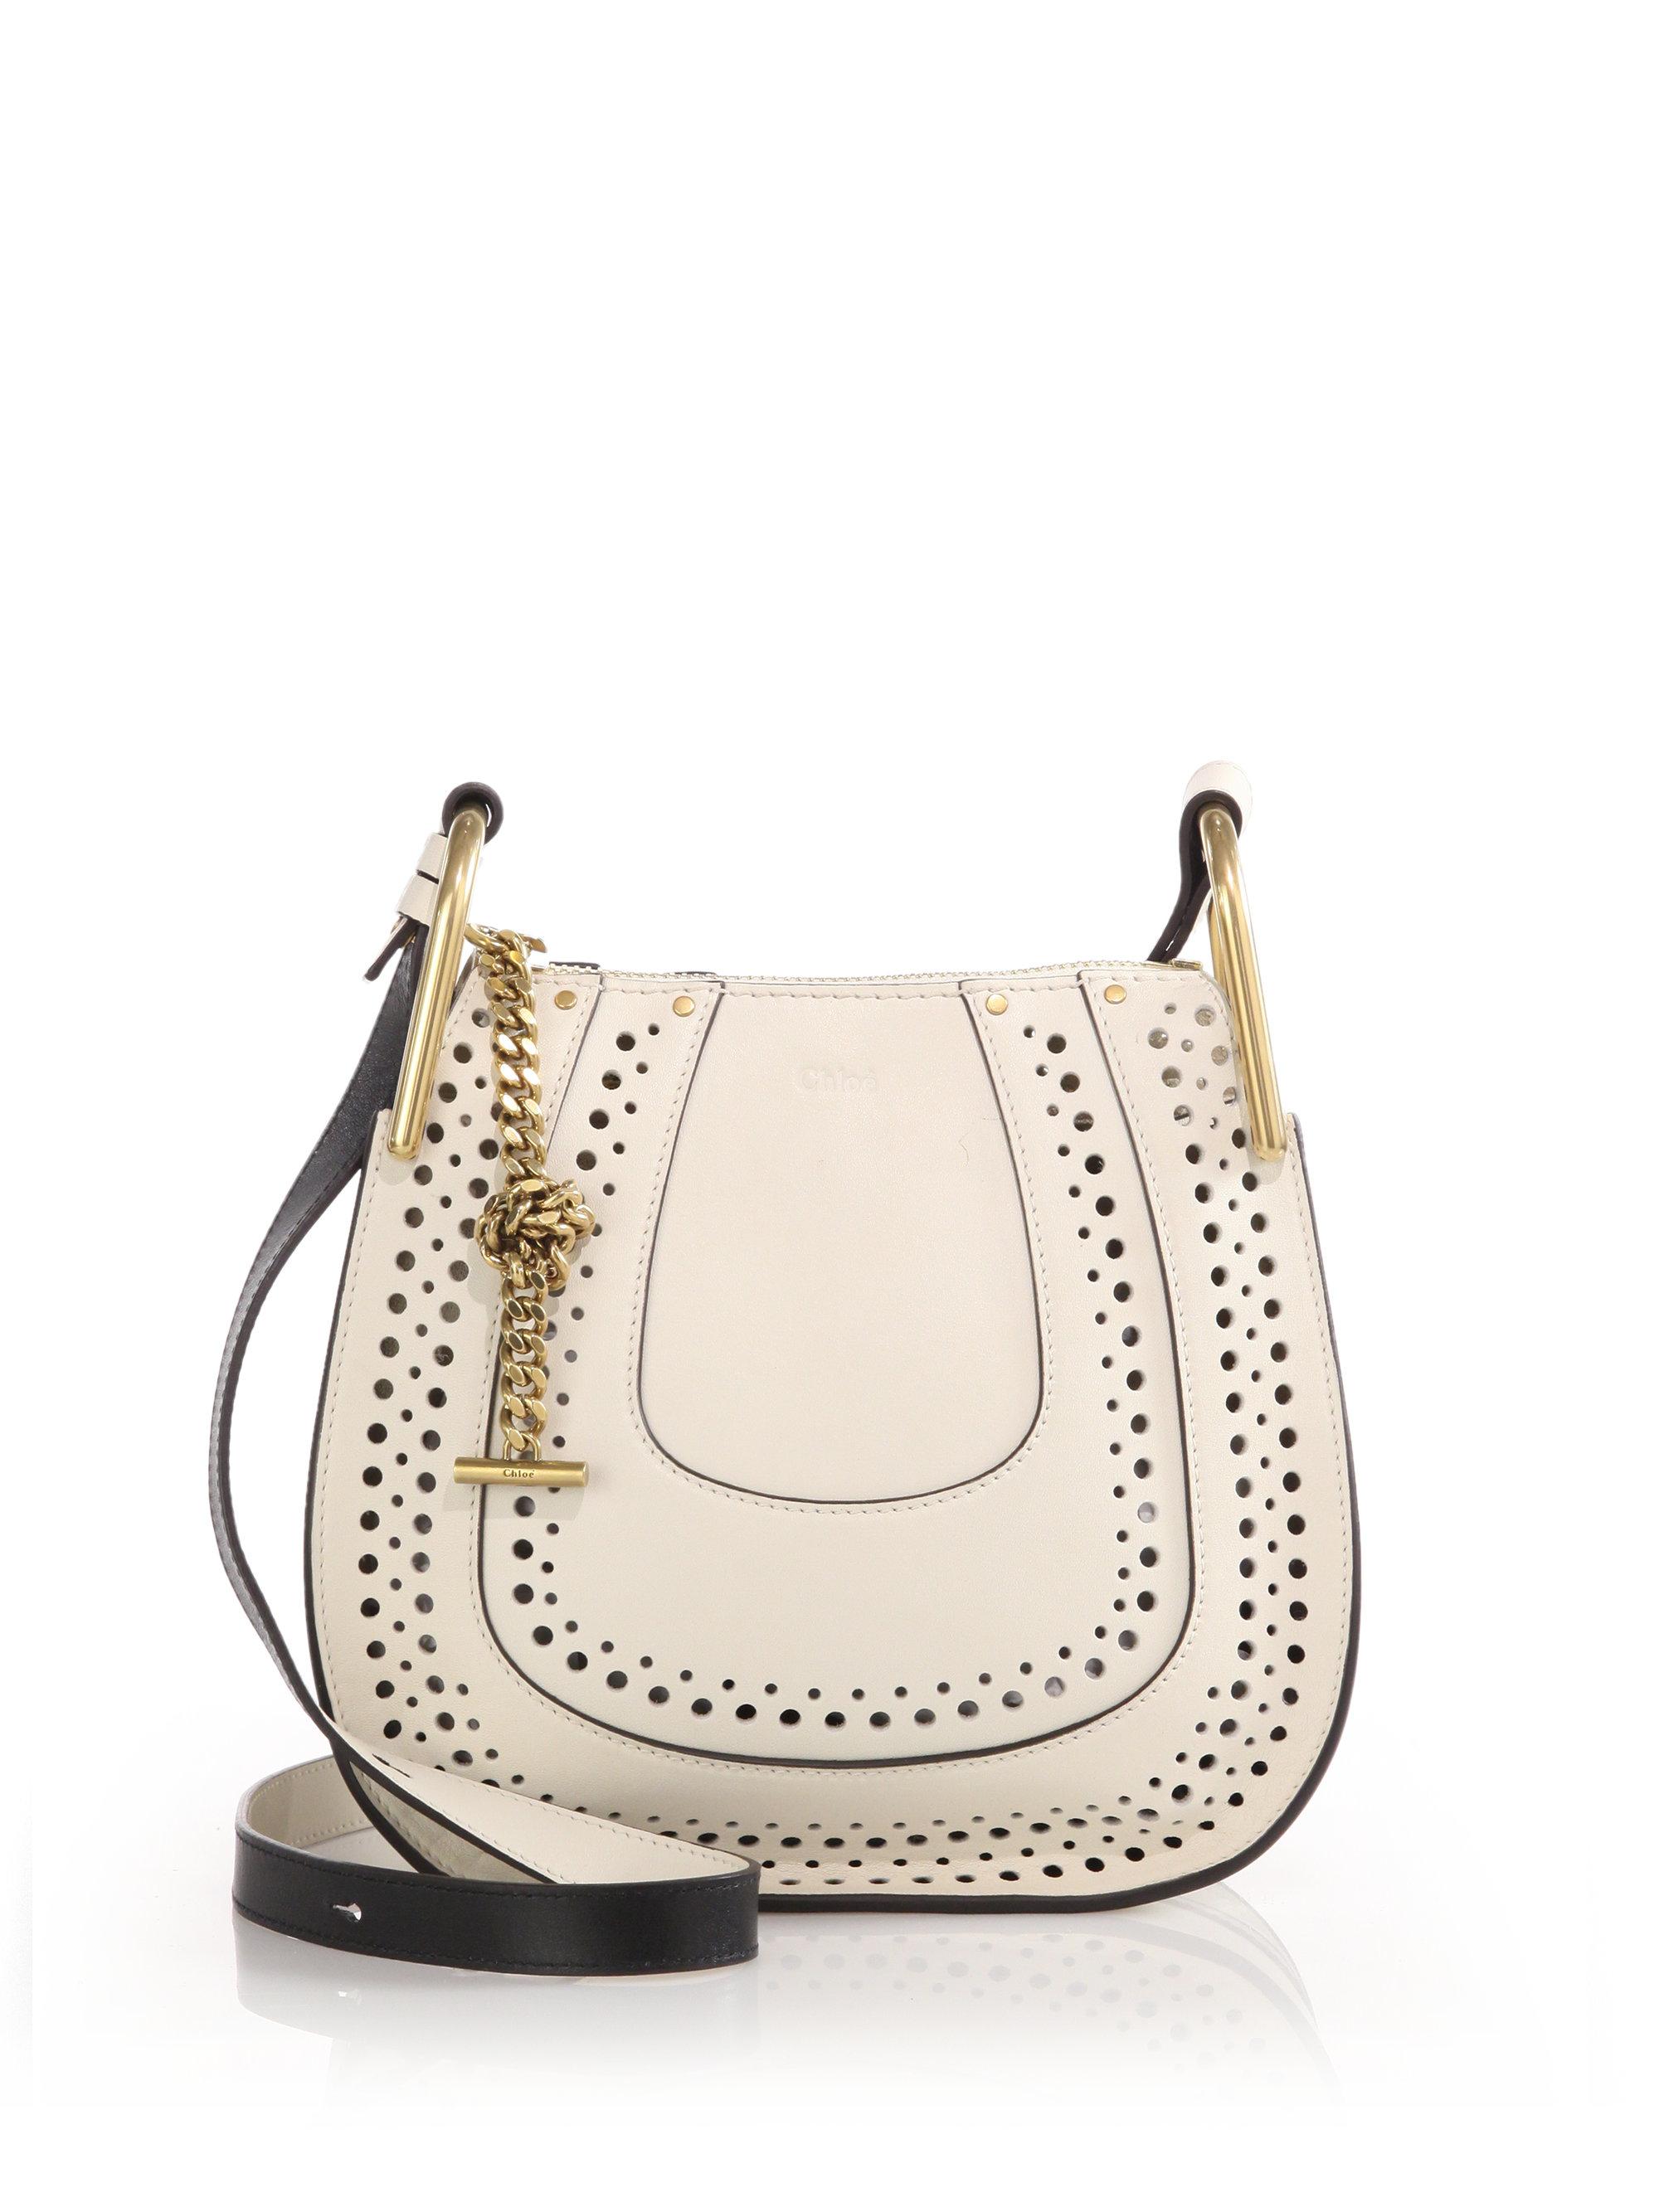 how to spot a fake chloe - chloe hayley small suede shoulder bag, chloe shop online